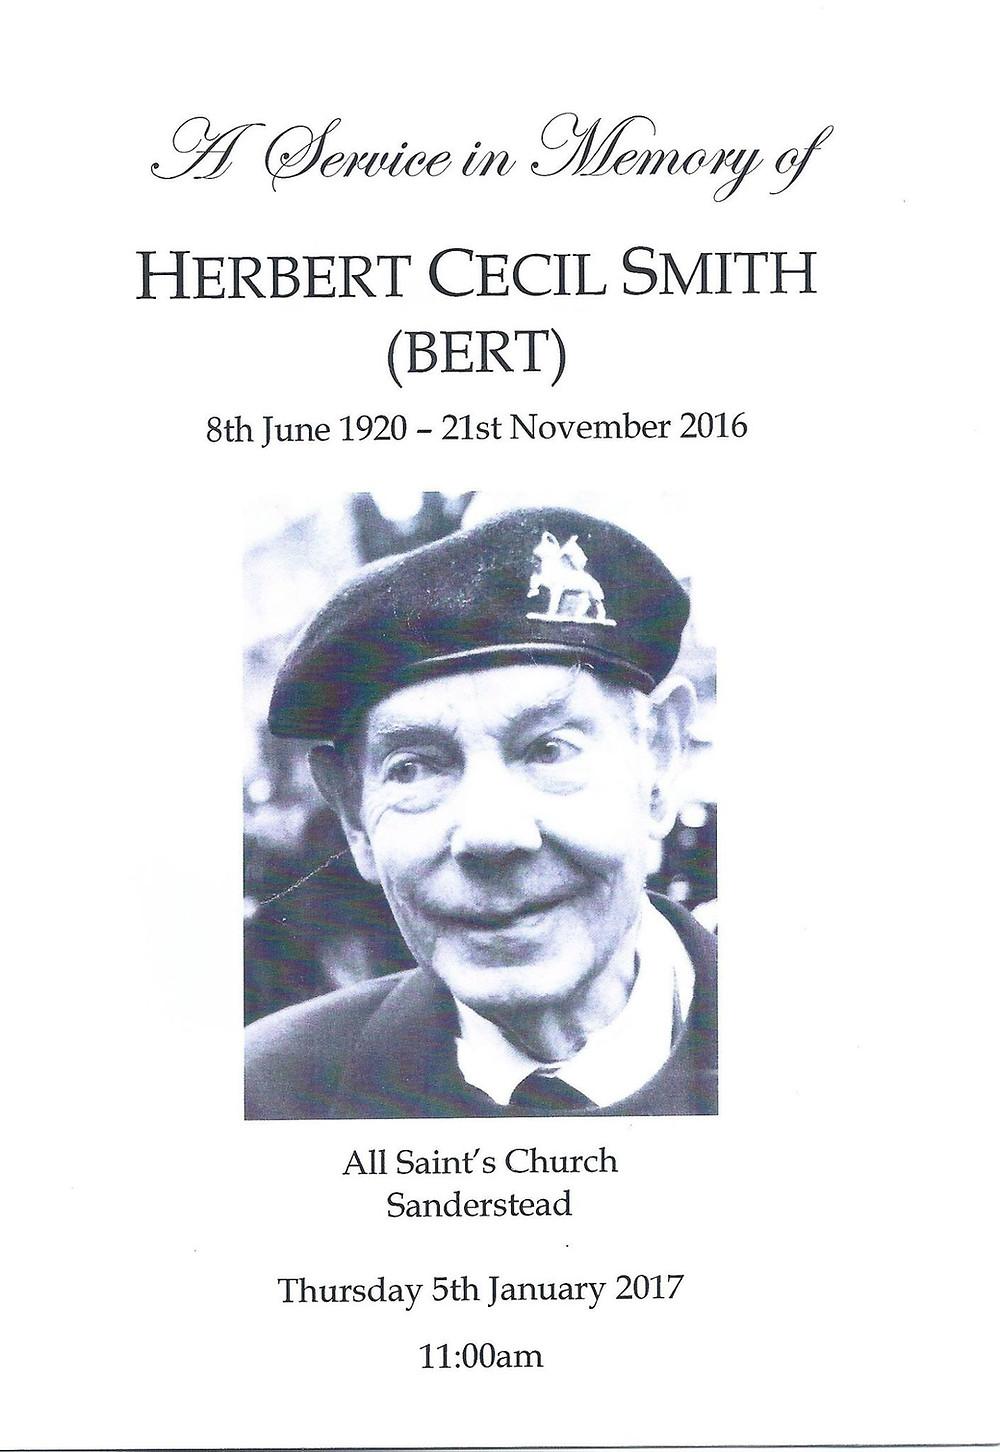 Bert Smith - Order of Service